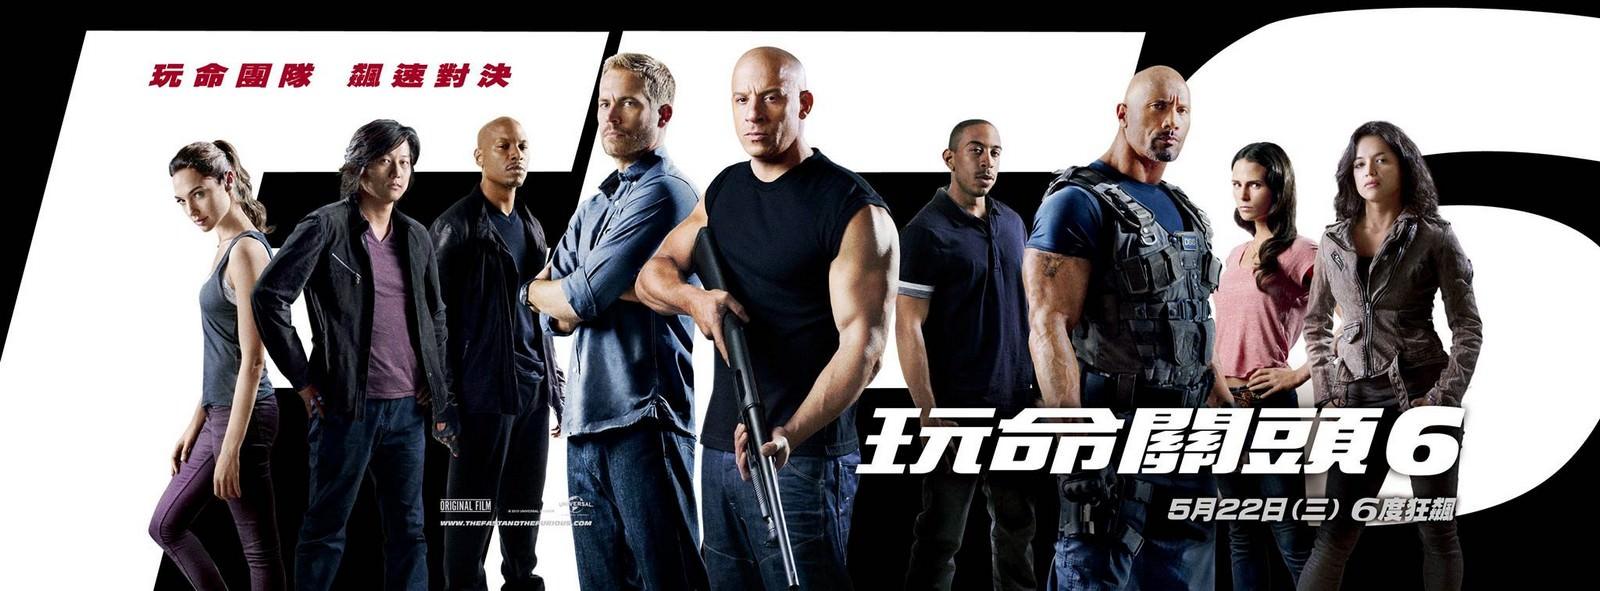 Movie, Fast & Furious 6(美國, 2013年) / 玩命關頭6(台灣) / 速度与激情6(中國) / 狂野時速6(香港), 電影海報, 台灣, 橫版